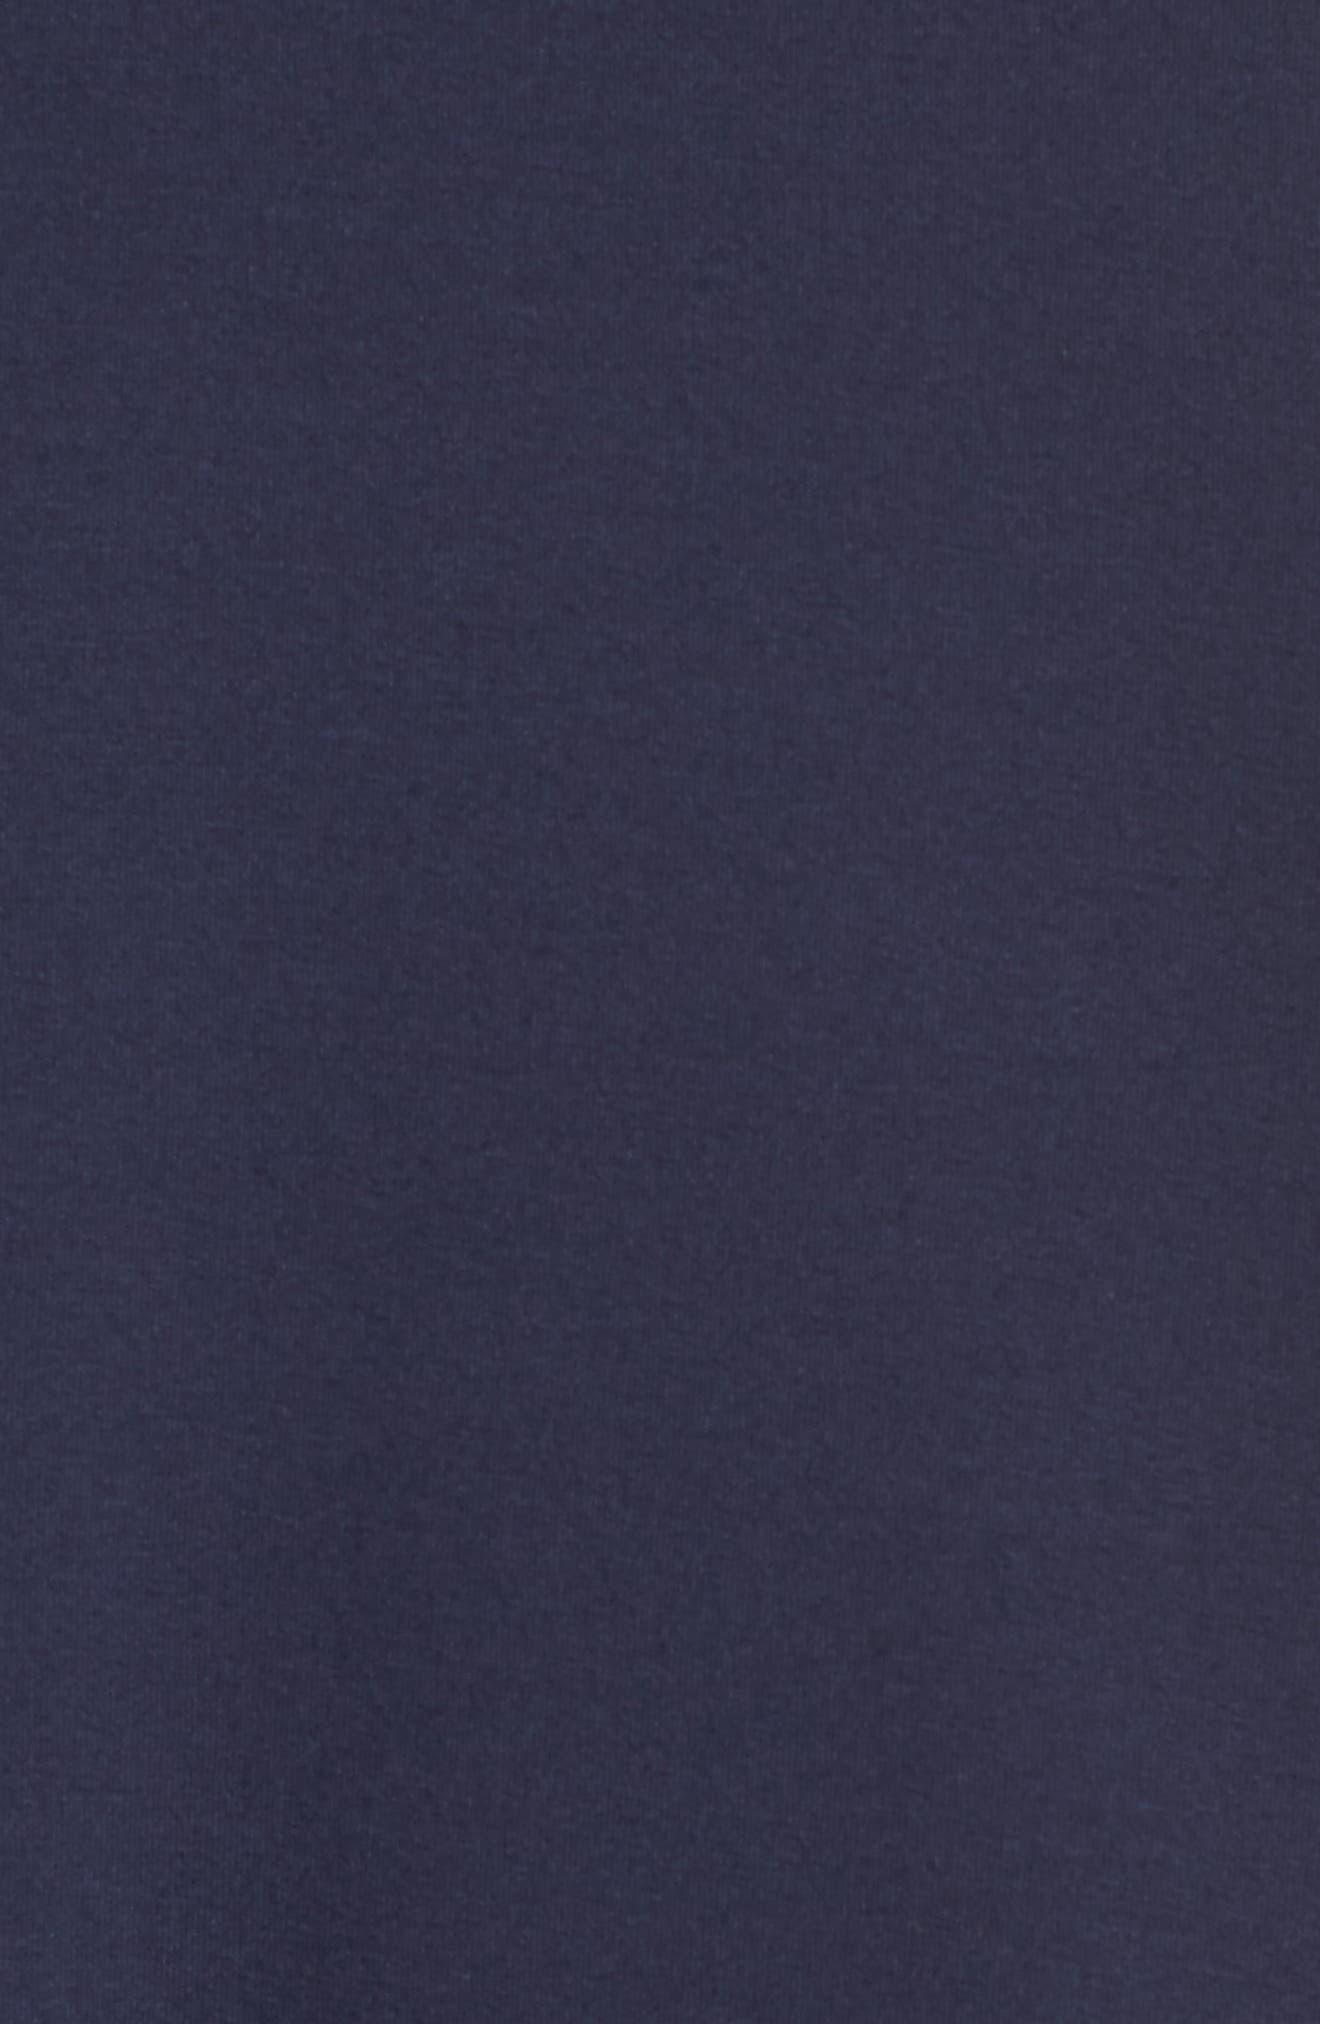 Sophie UPF 50+ Dress,                             Alternate thumbnail 5, color,                             True Navy